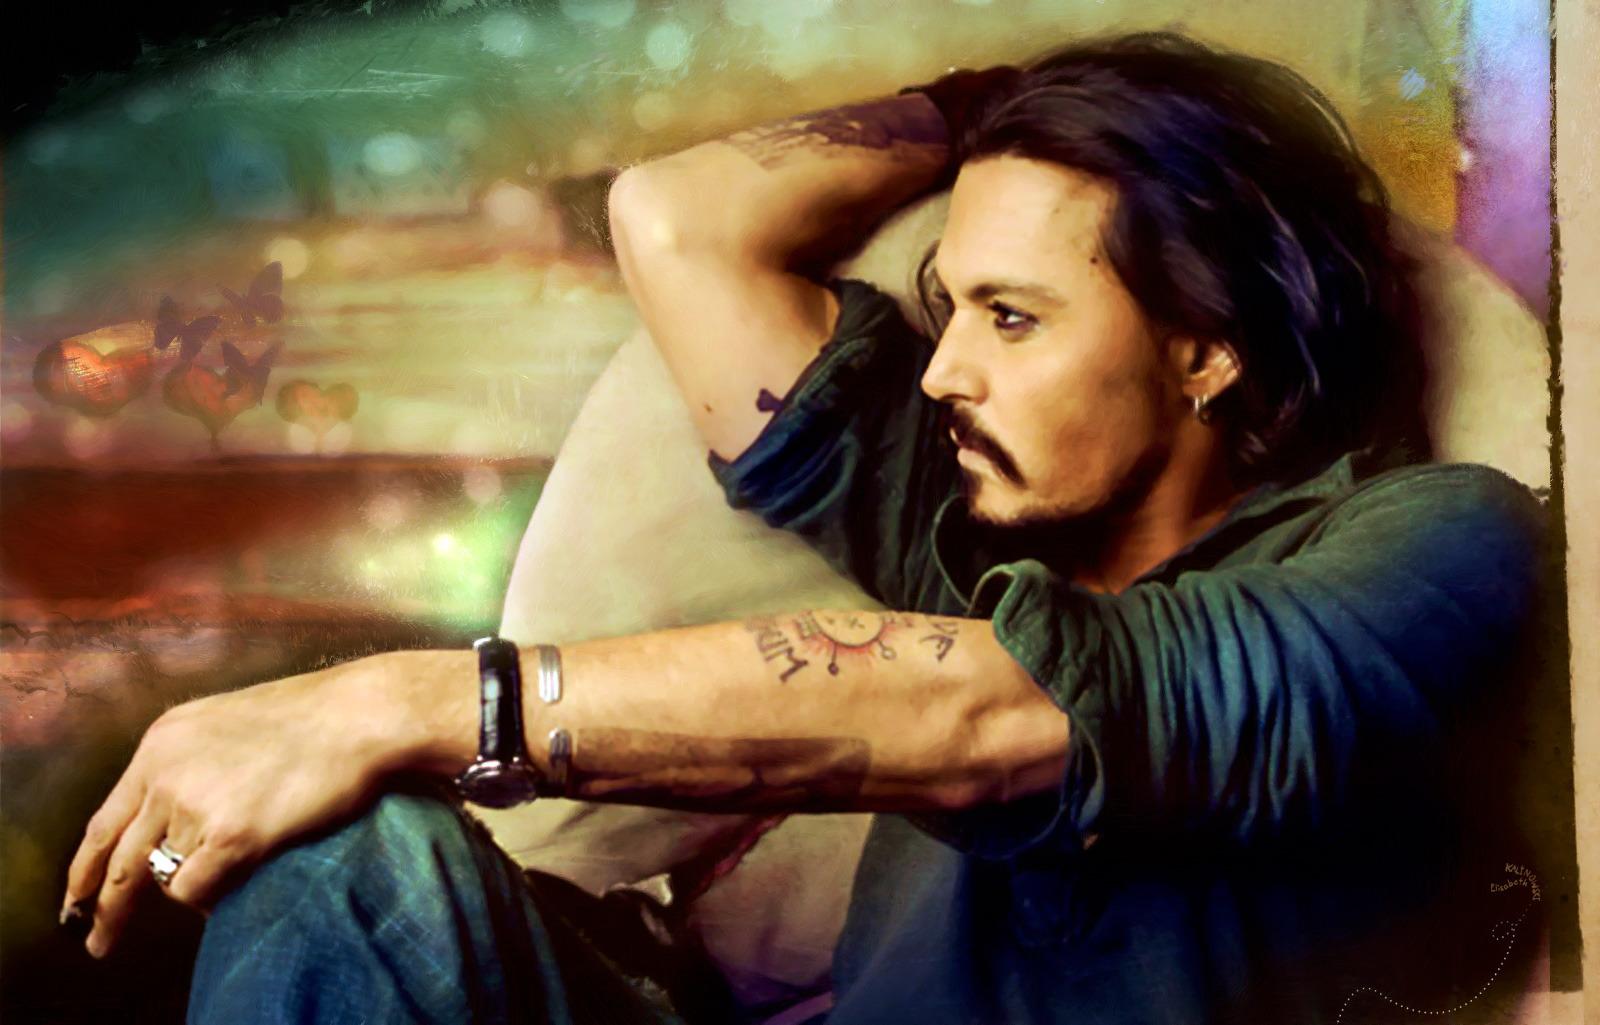 Wallpaper Backgrounds Johnny Depp   HD Celebrity Wallpapers 1600x1025